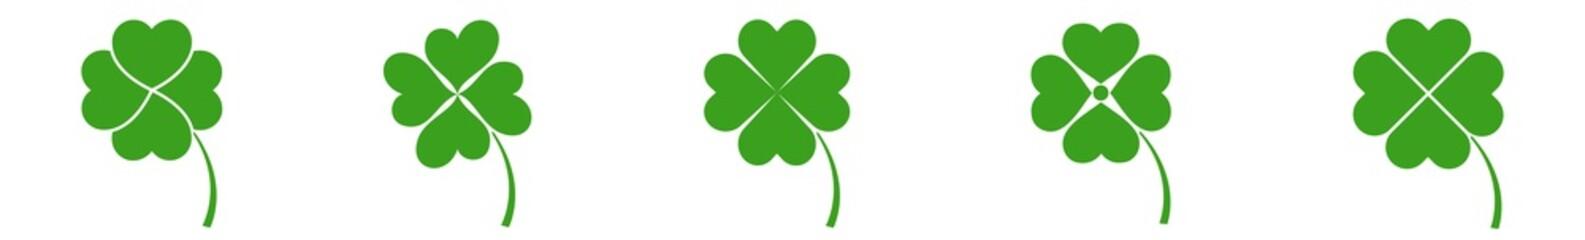 Shamrock Icon Green | Shamrocks | Four Leaf Clover | Irish Symbol | St Patrick's Day Logo | Luck Sign | Isolated | Variations